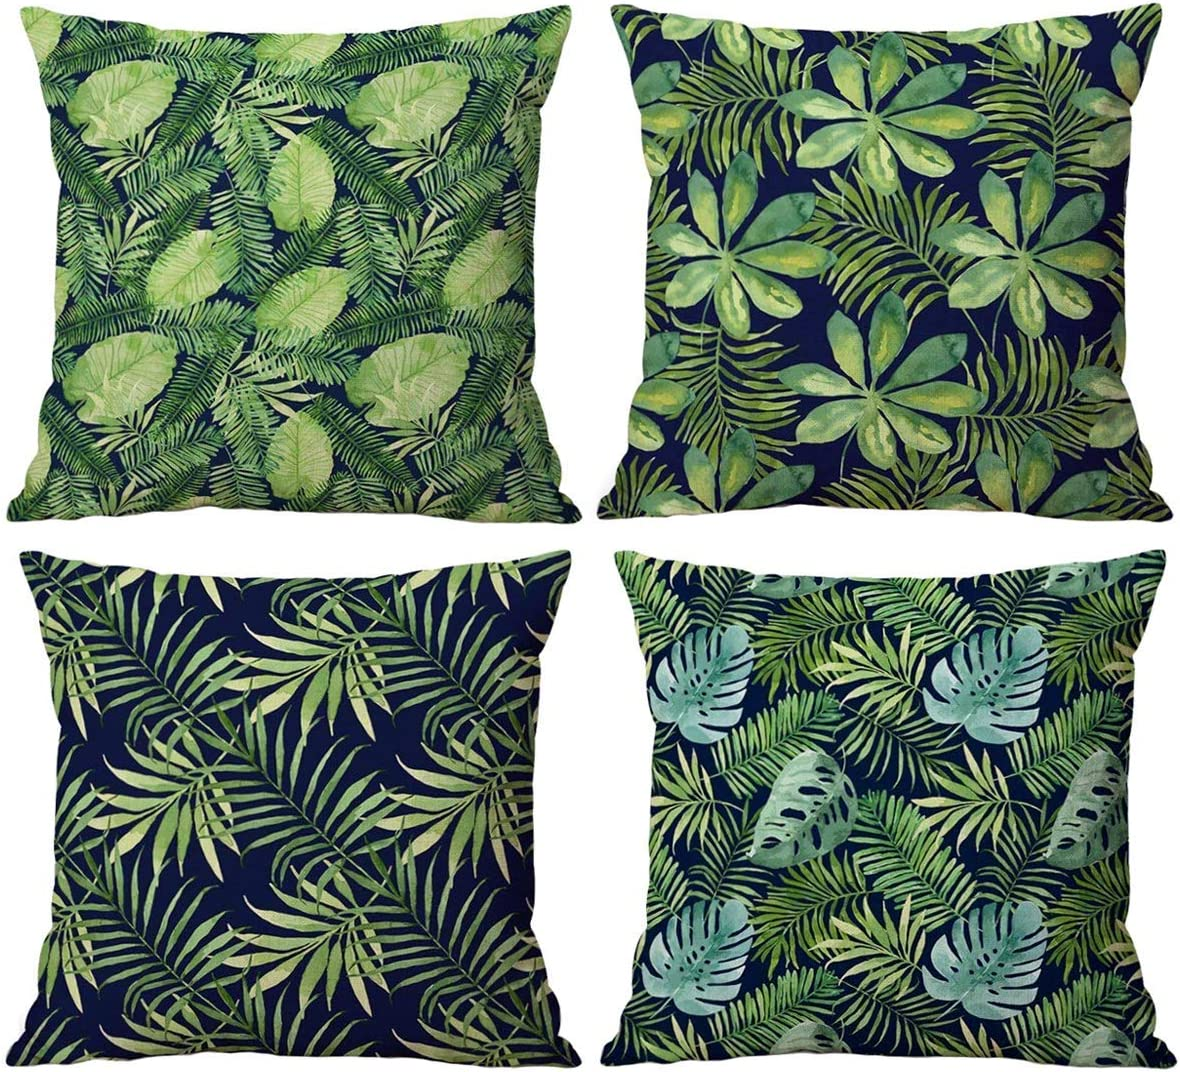 Harry wang Pack de 2 Fundas Decorativas New Luxury Series Style Pink Faux Fur Throw Pillow Funda de cojín para Sofa ...